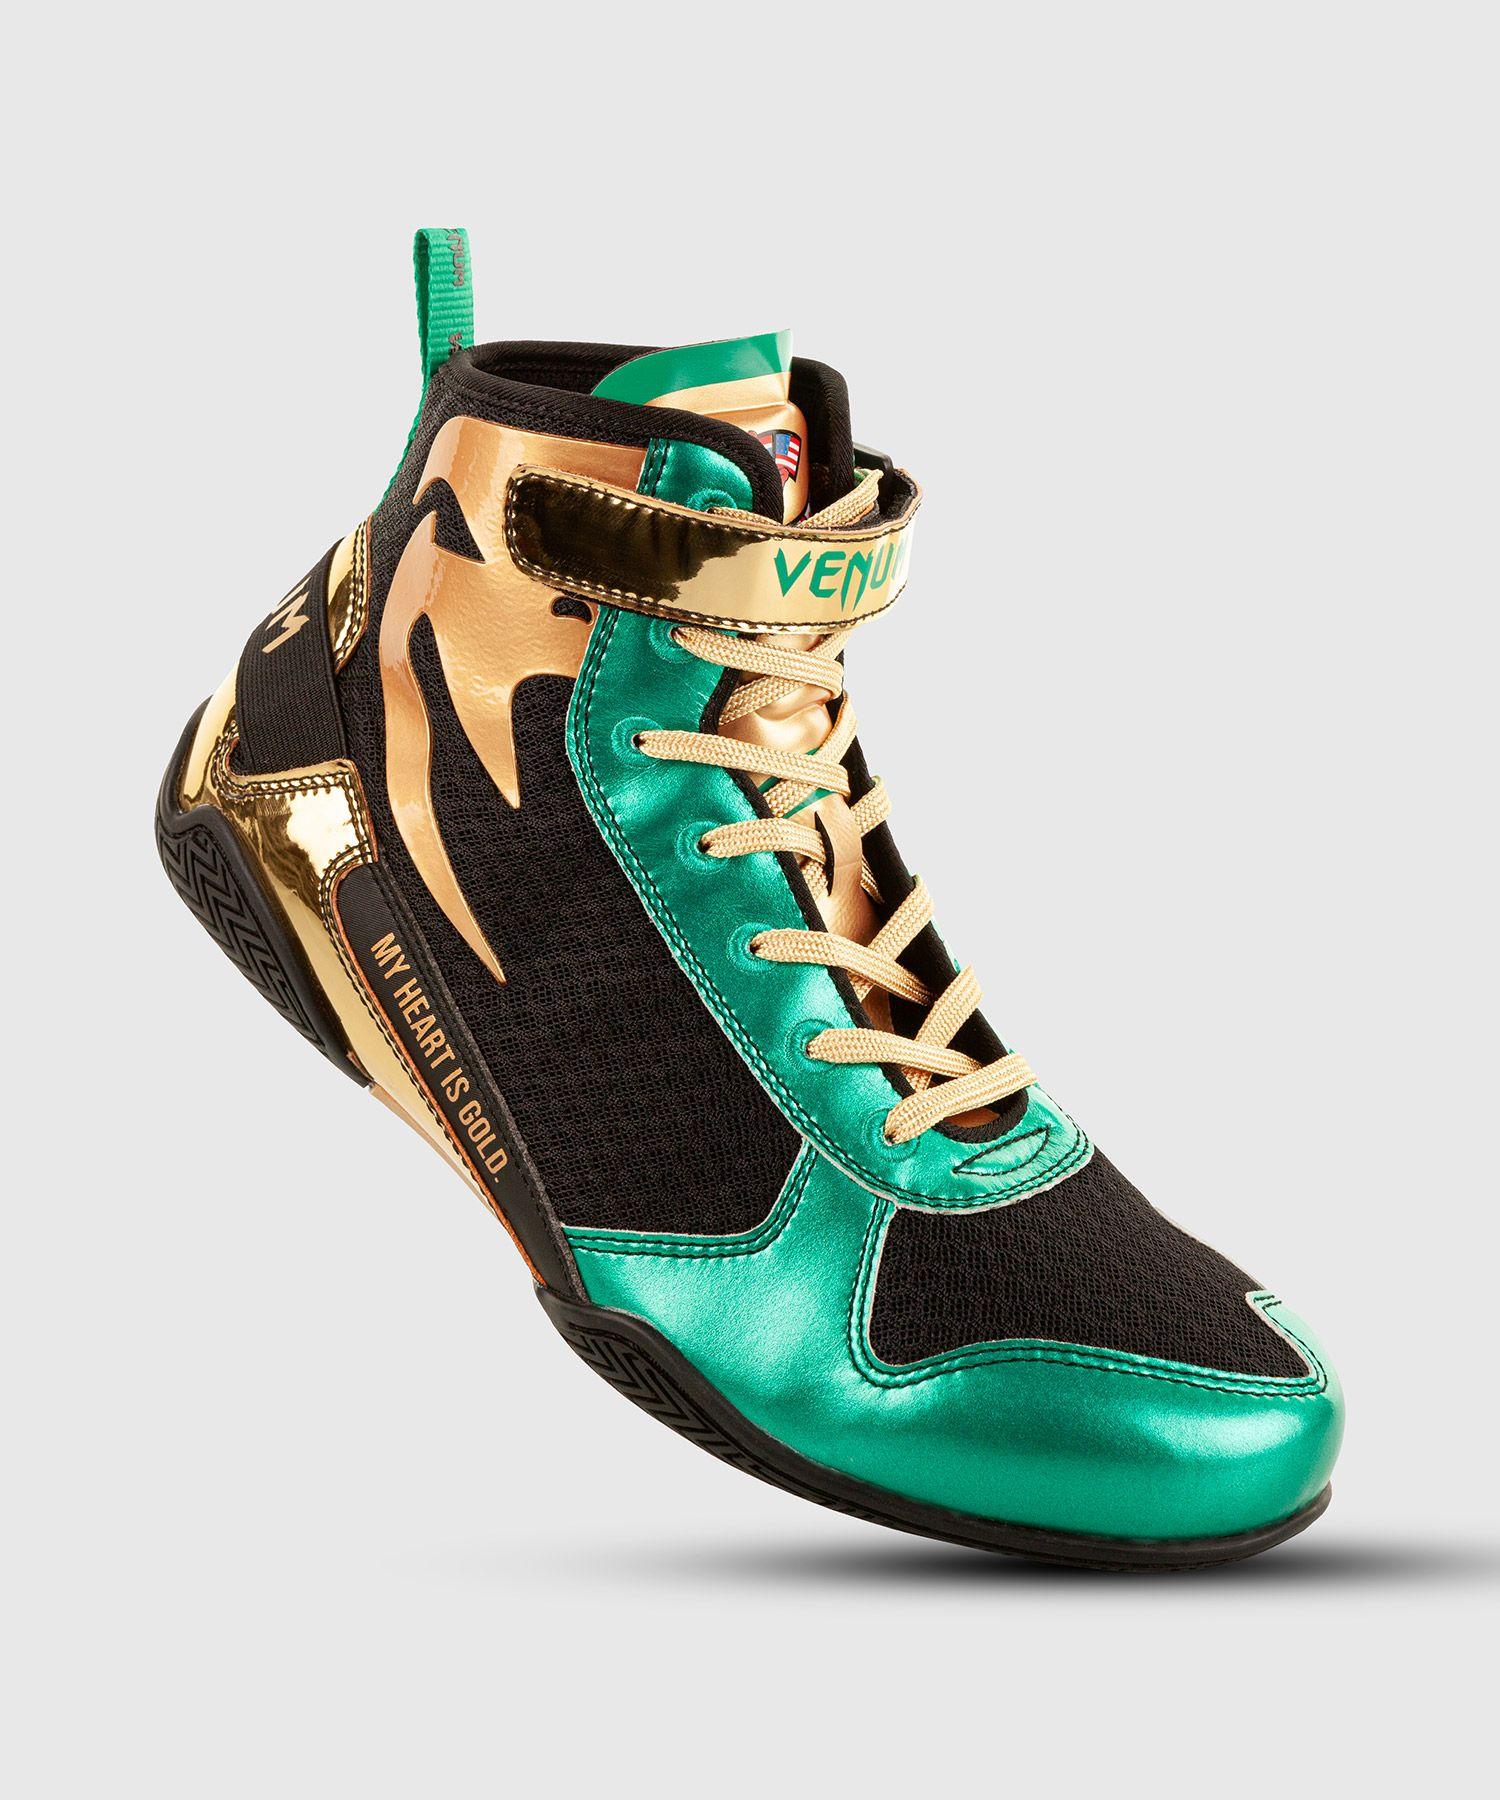 Botas de boxeo Venum Giant Low Boxing - Edición limitada WBC - Verde metálico/Oro